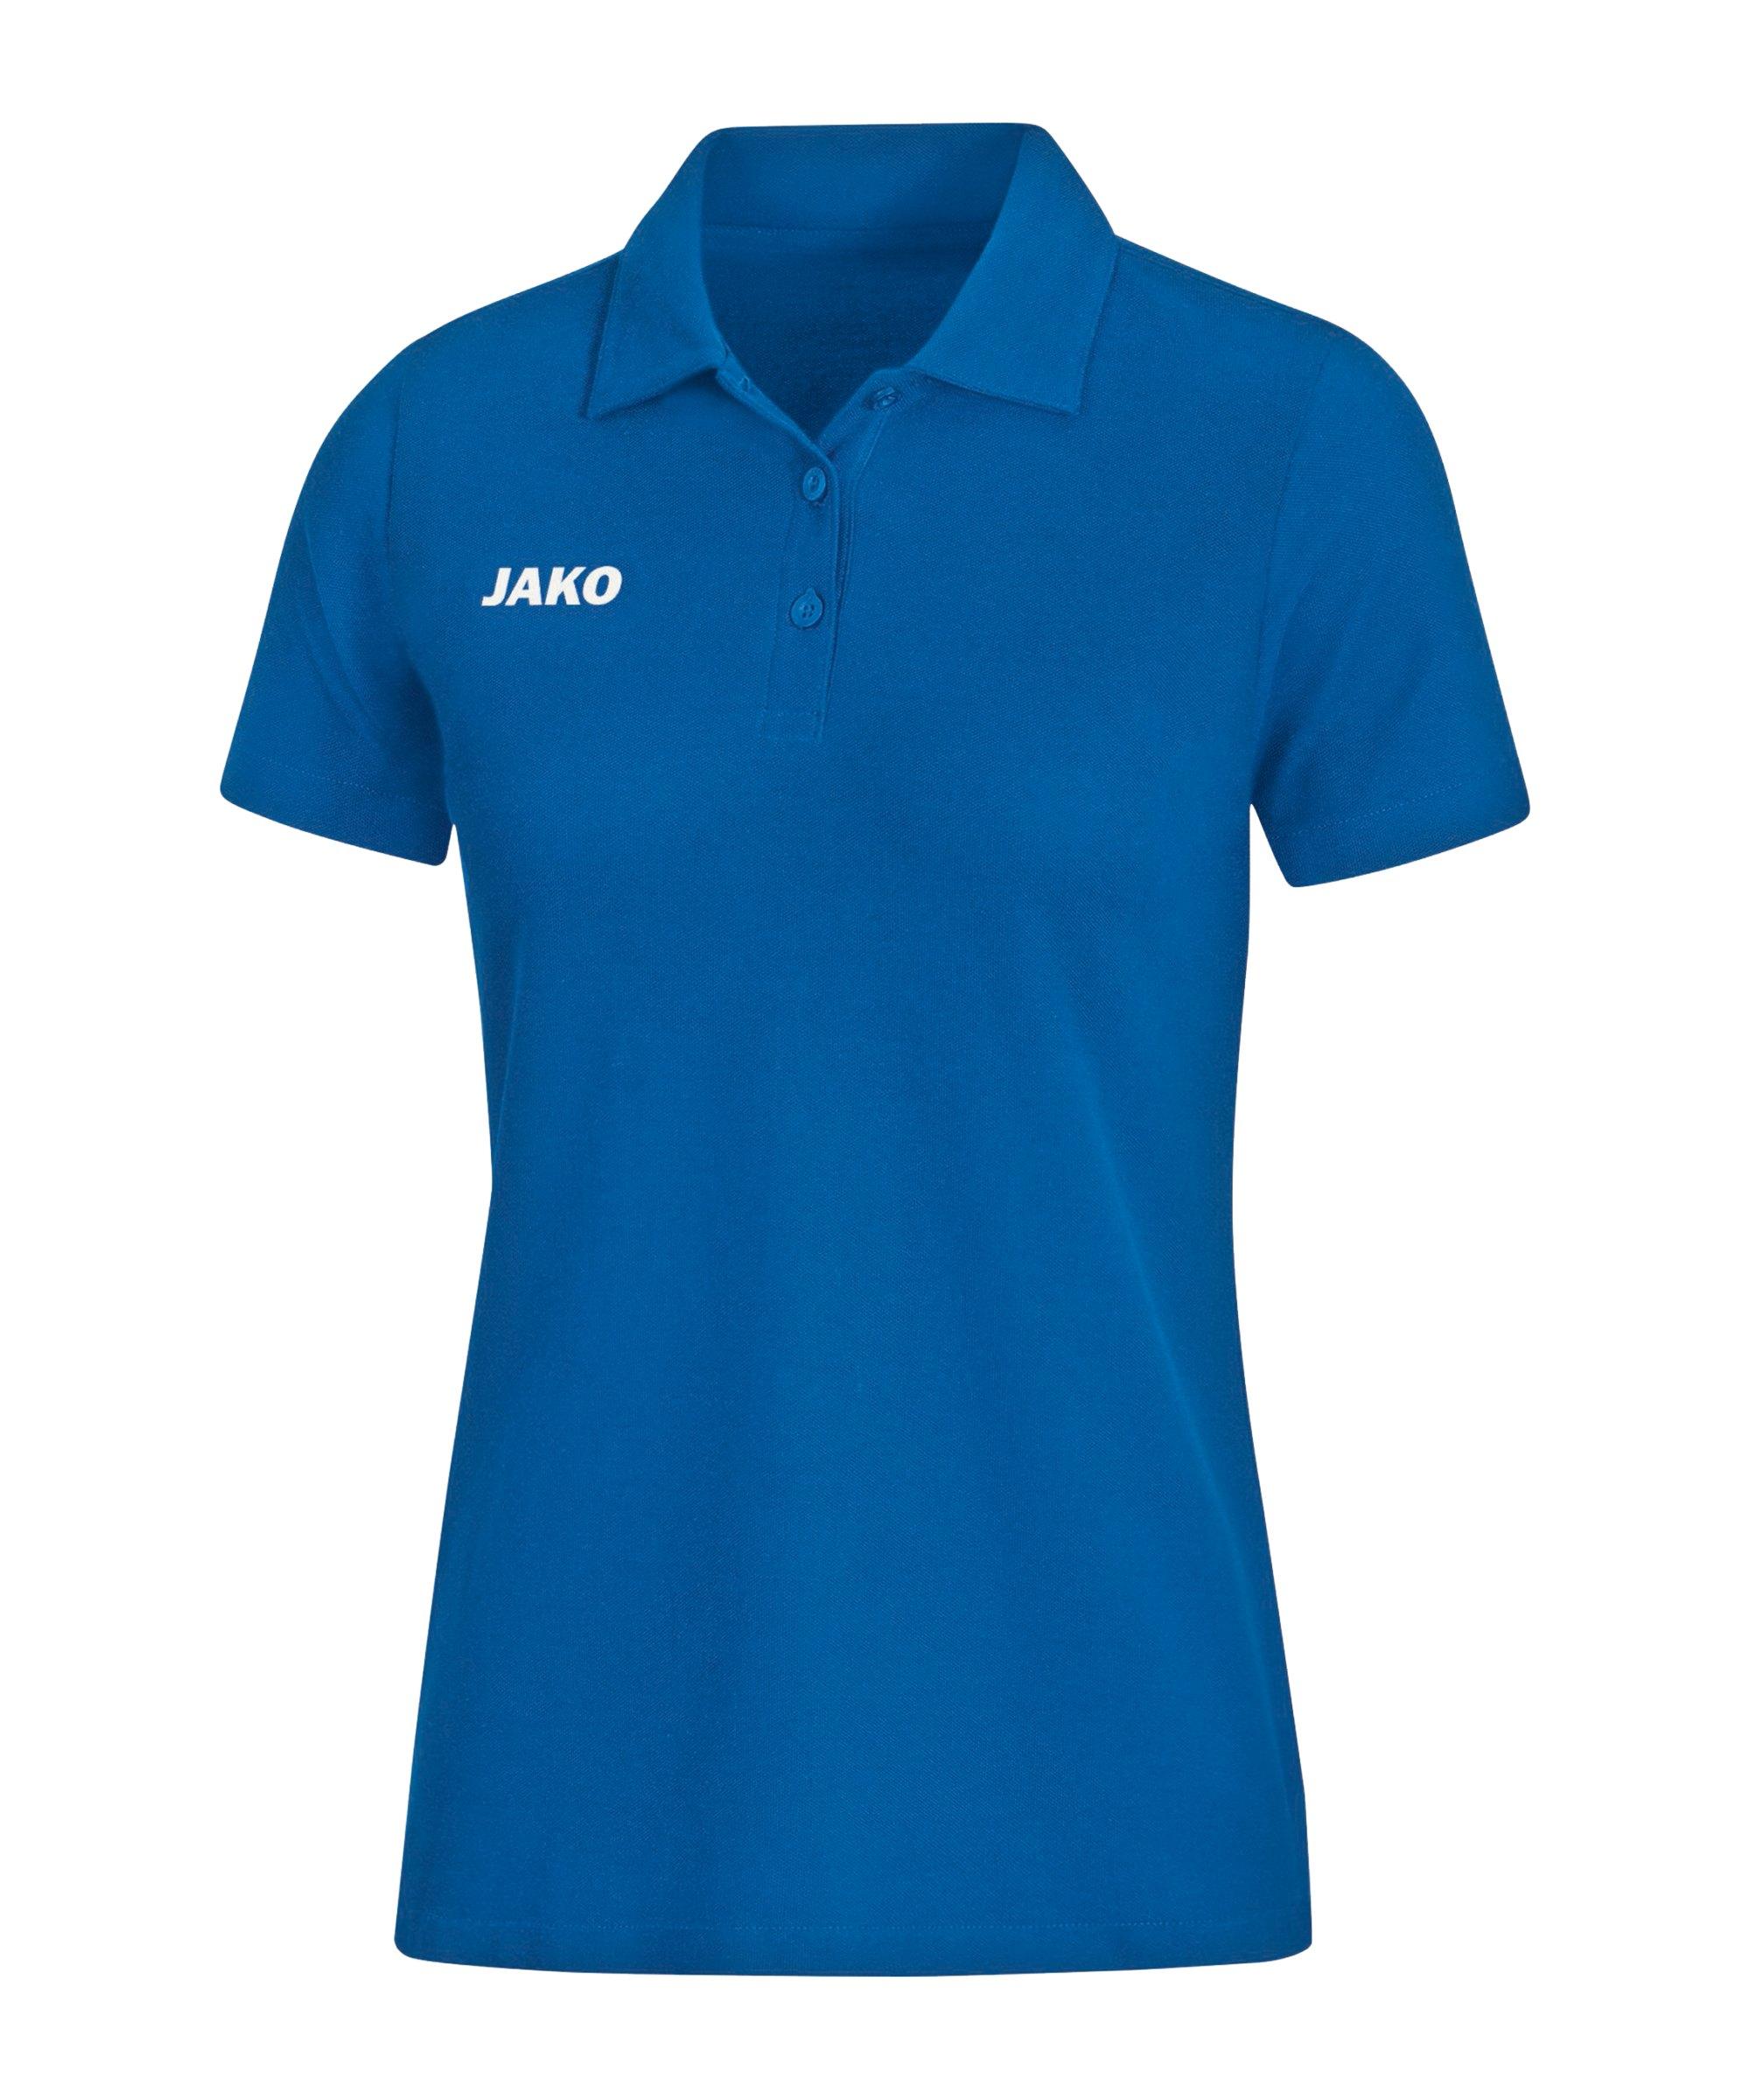 JAKO Base Poloshirt Damen Blau F04 - blau